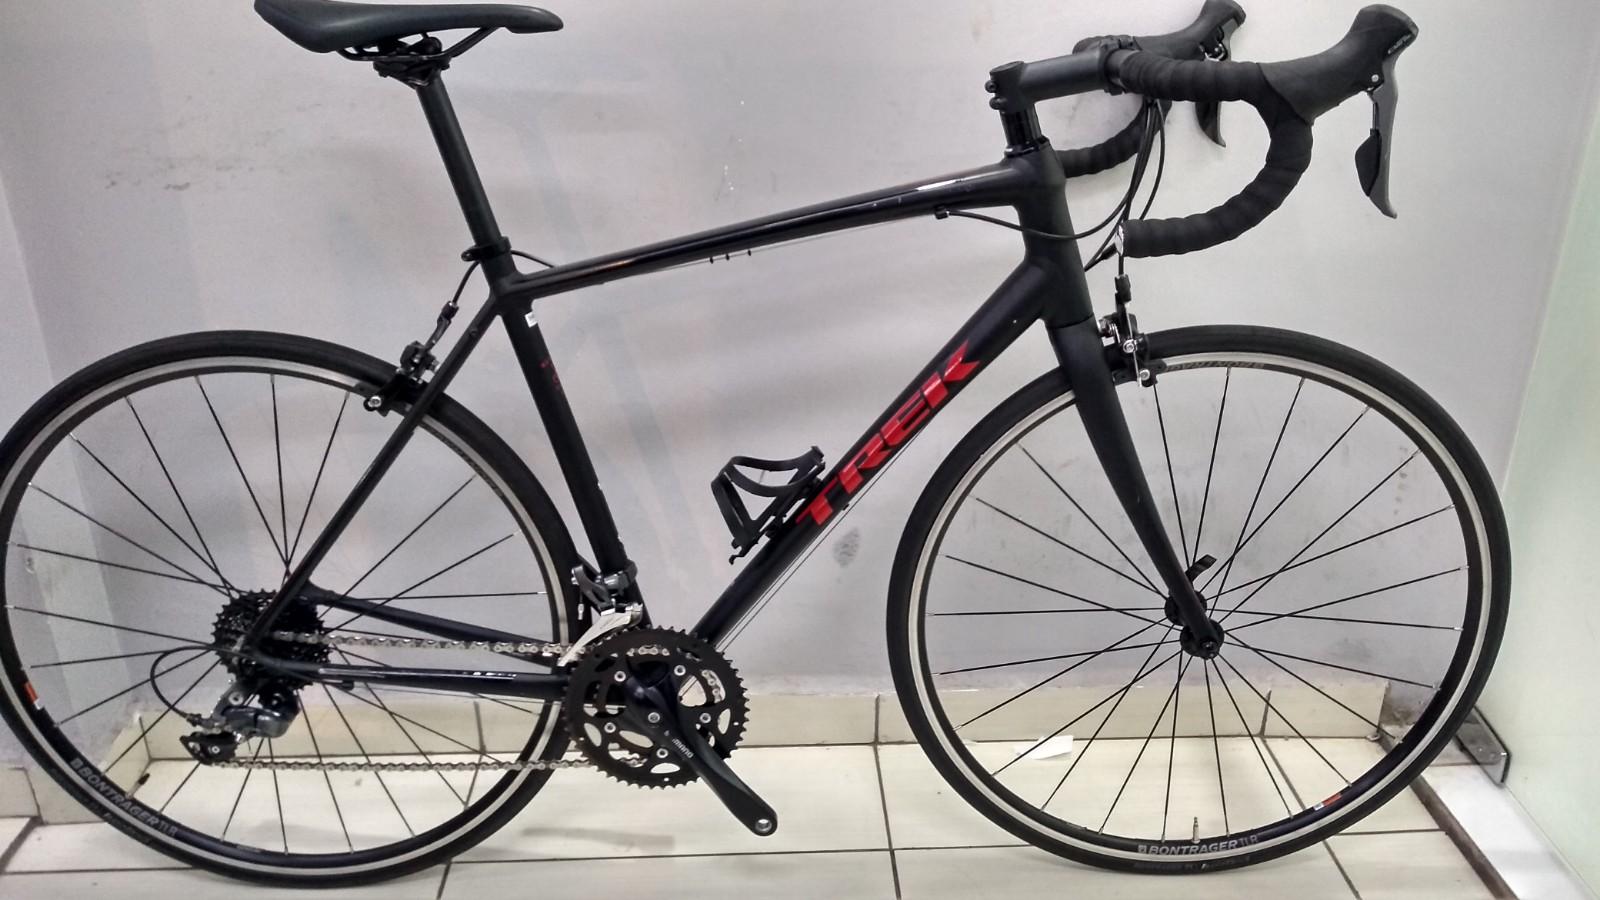 Bicicleta Trek Domane AL 2 - tamanho 56cm (Produto usado)